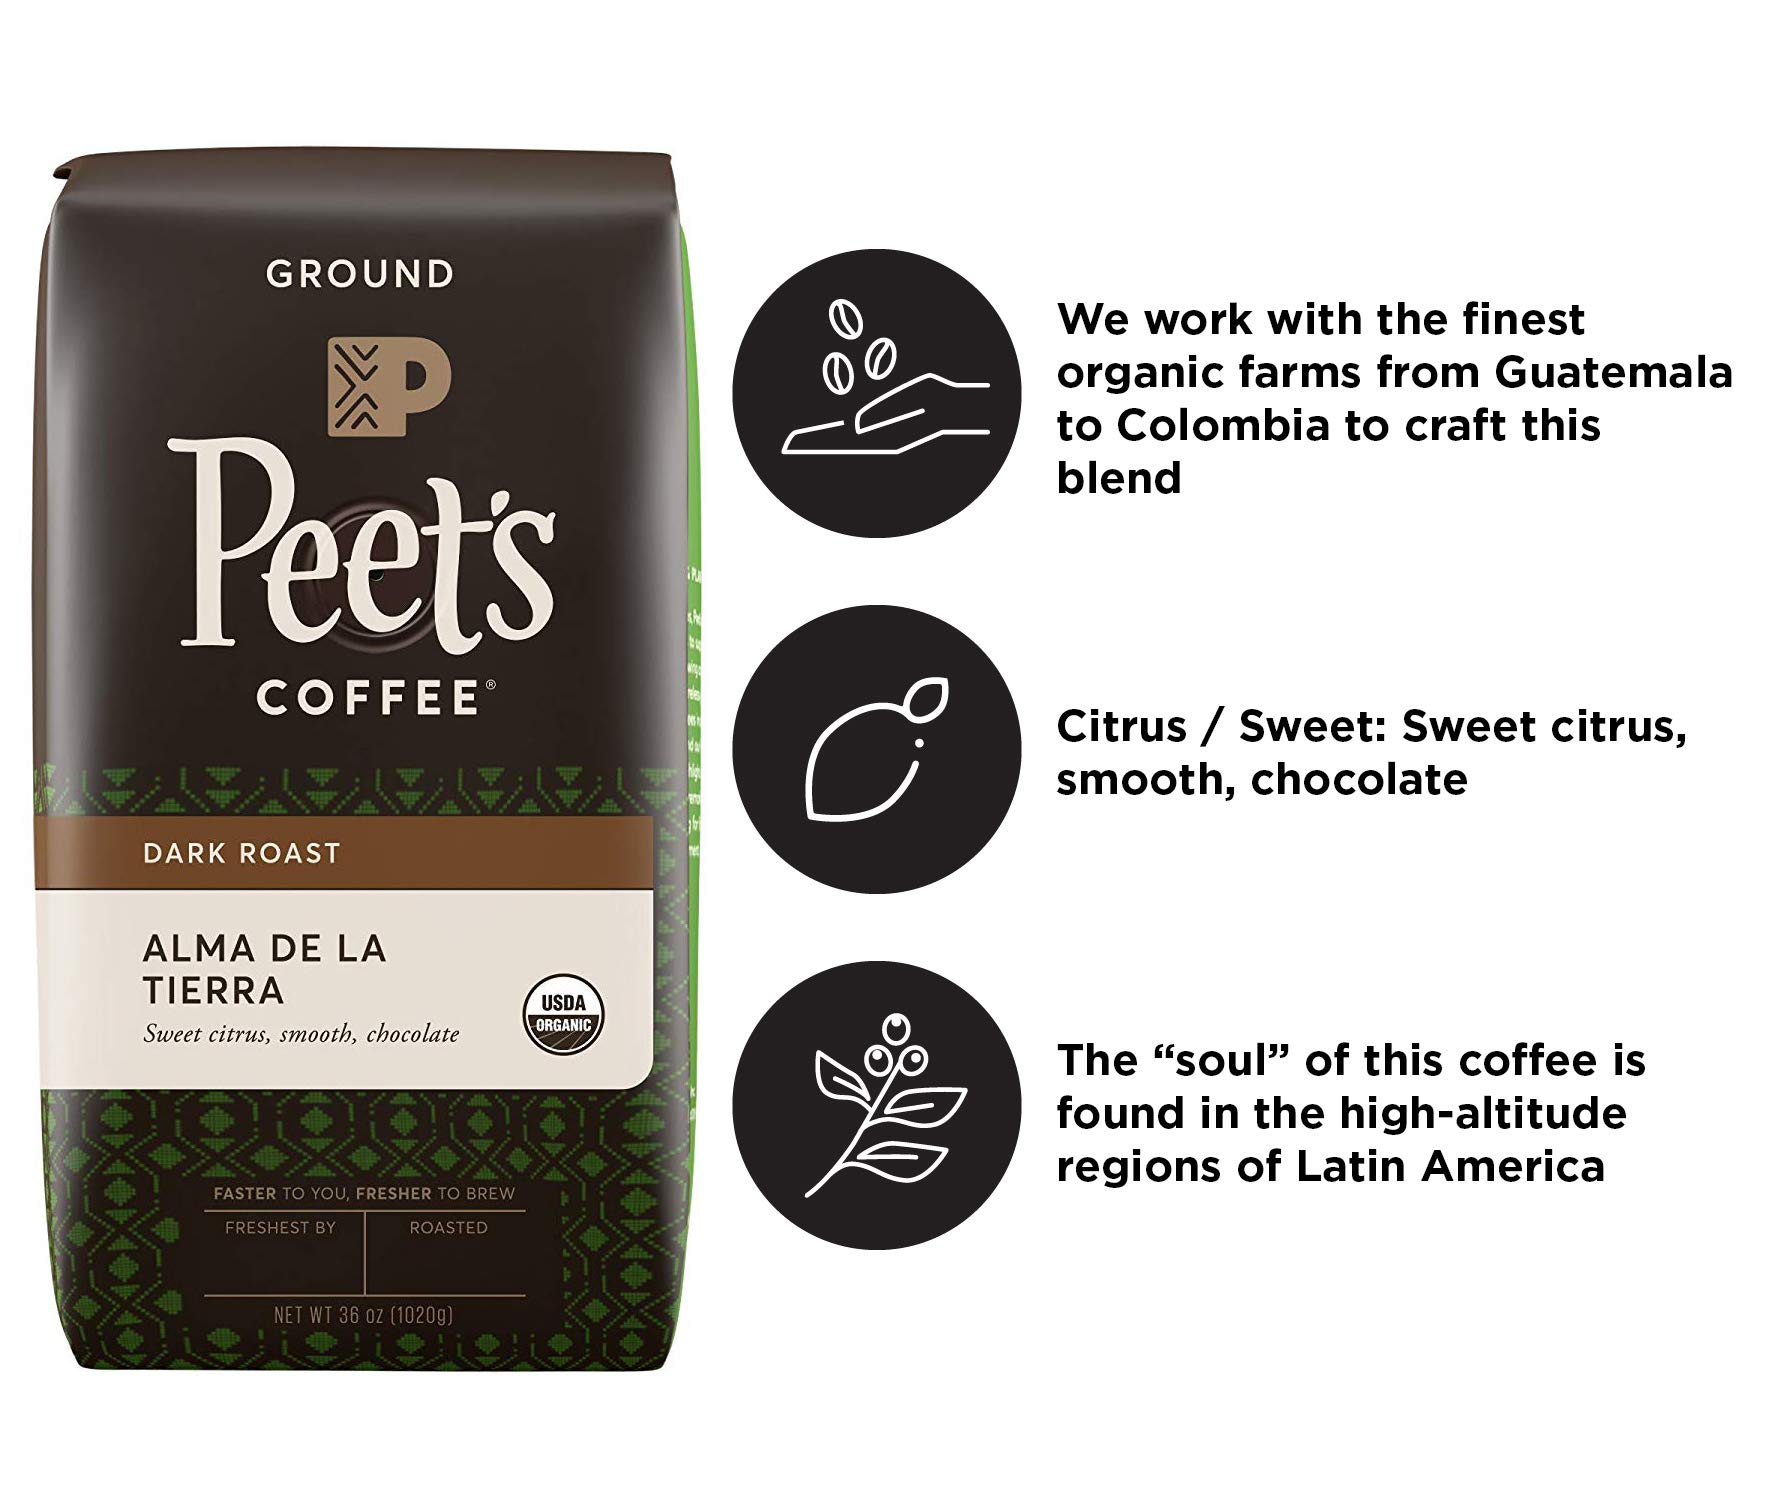 Peet's Coffee Alma de la Tierra Dark Roast Ground Coffee Organic, 2.25 Pound Bag USDA Organic by Peet's Coffee (Image #2)